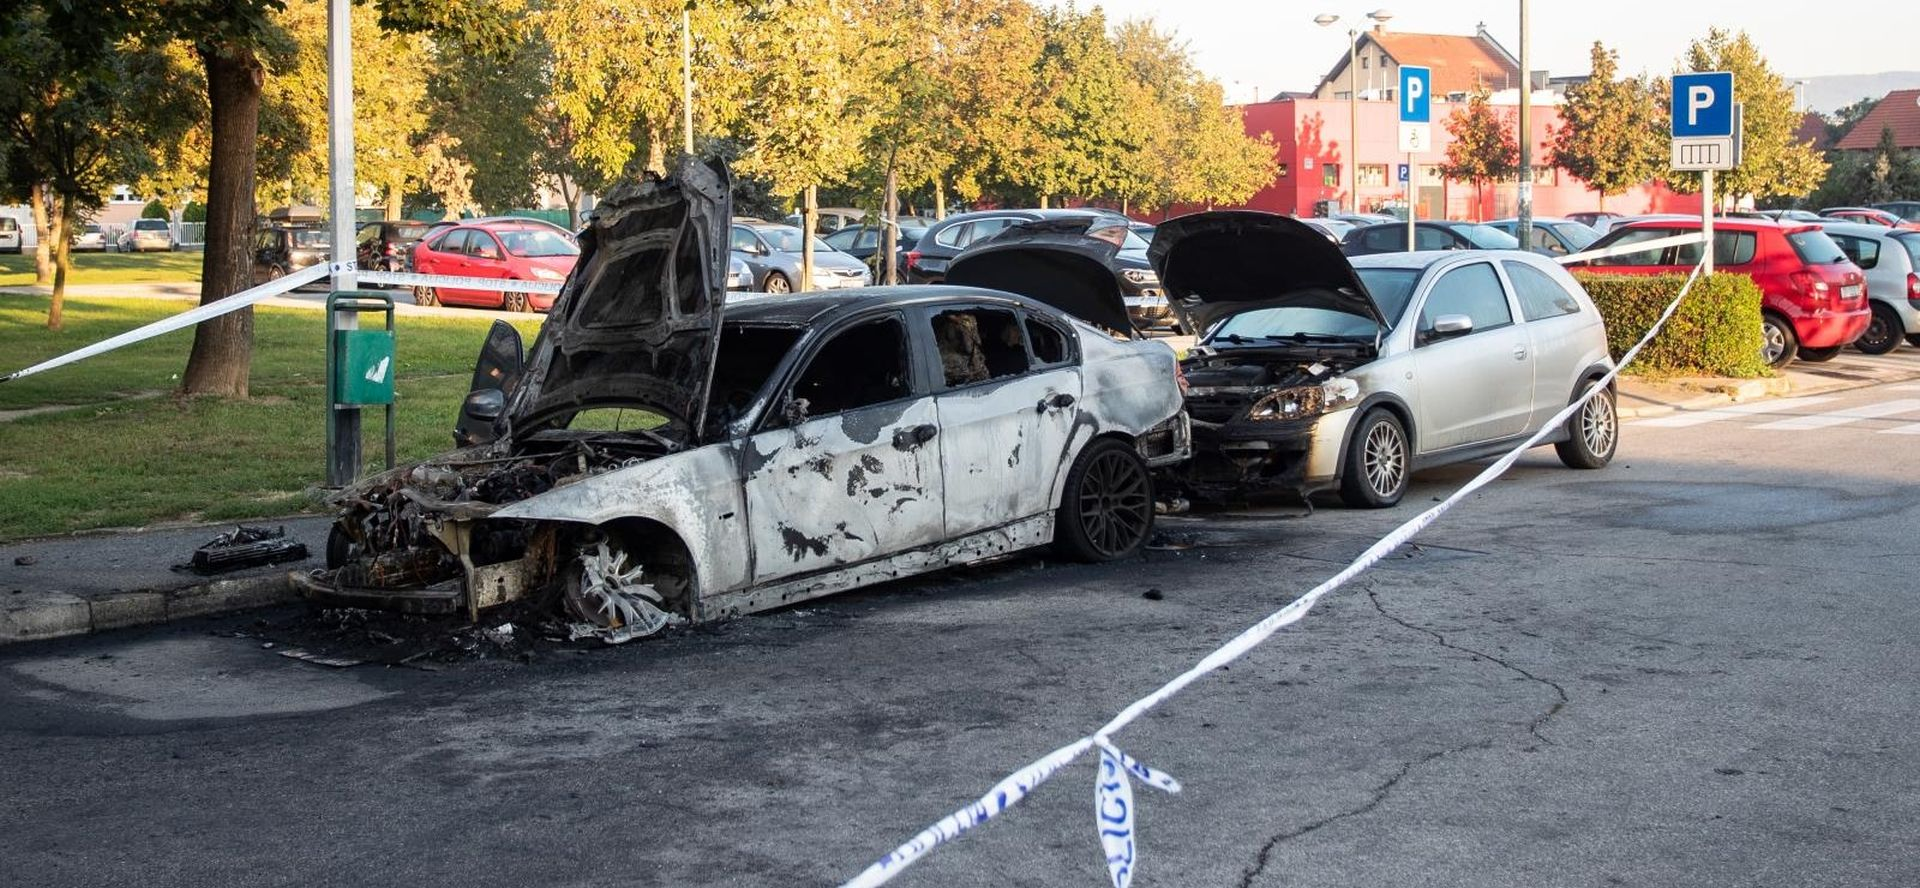 VIDEO: U Prečkom noćas gorjela dva automobila